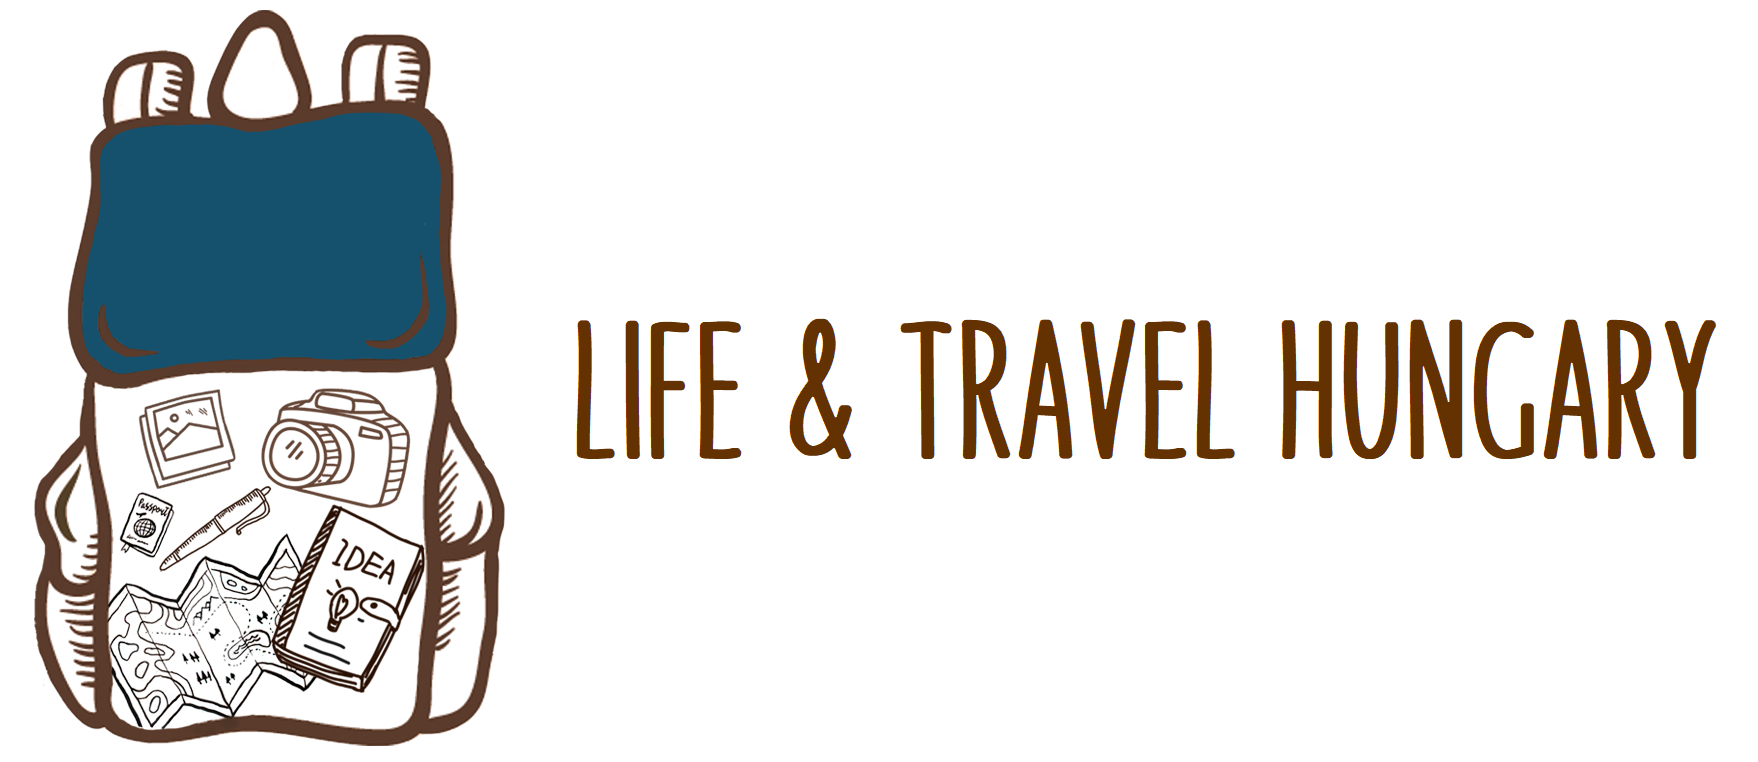 Life & Travel Hungary